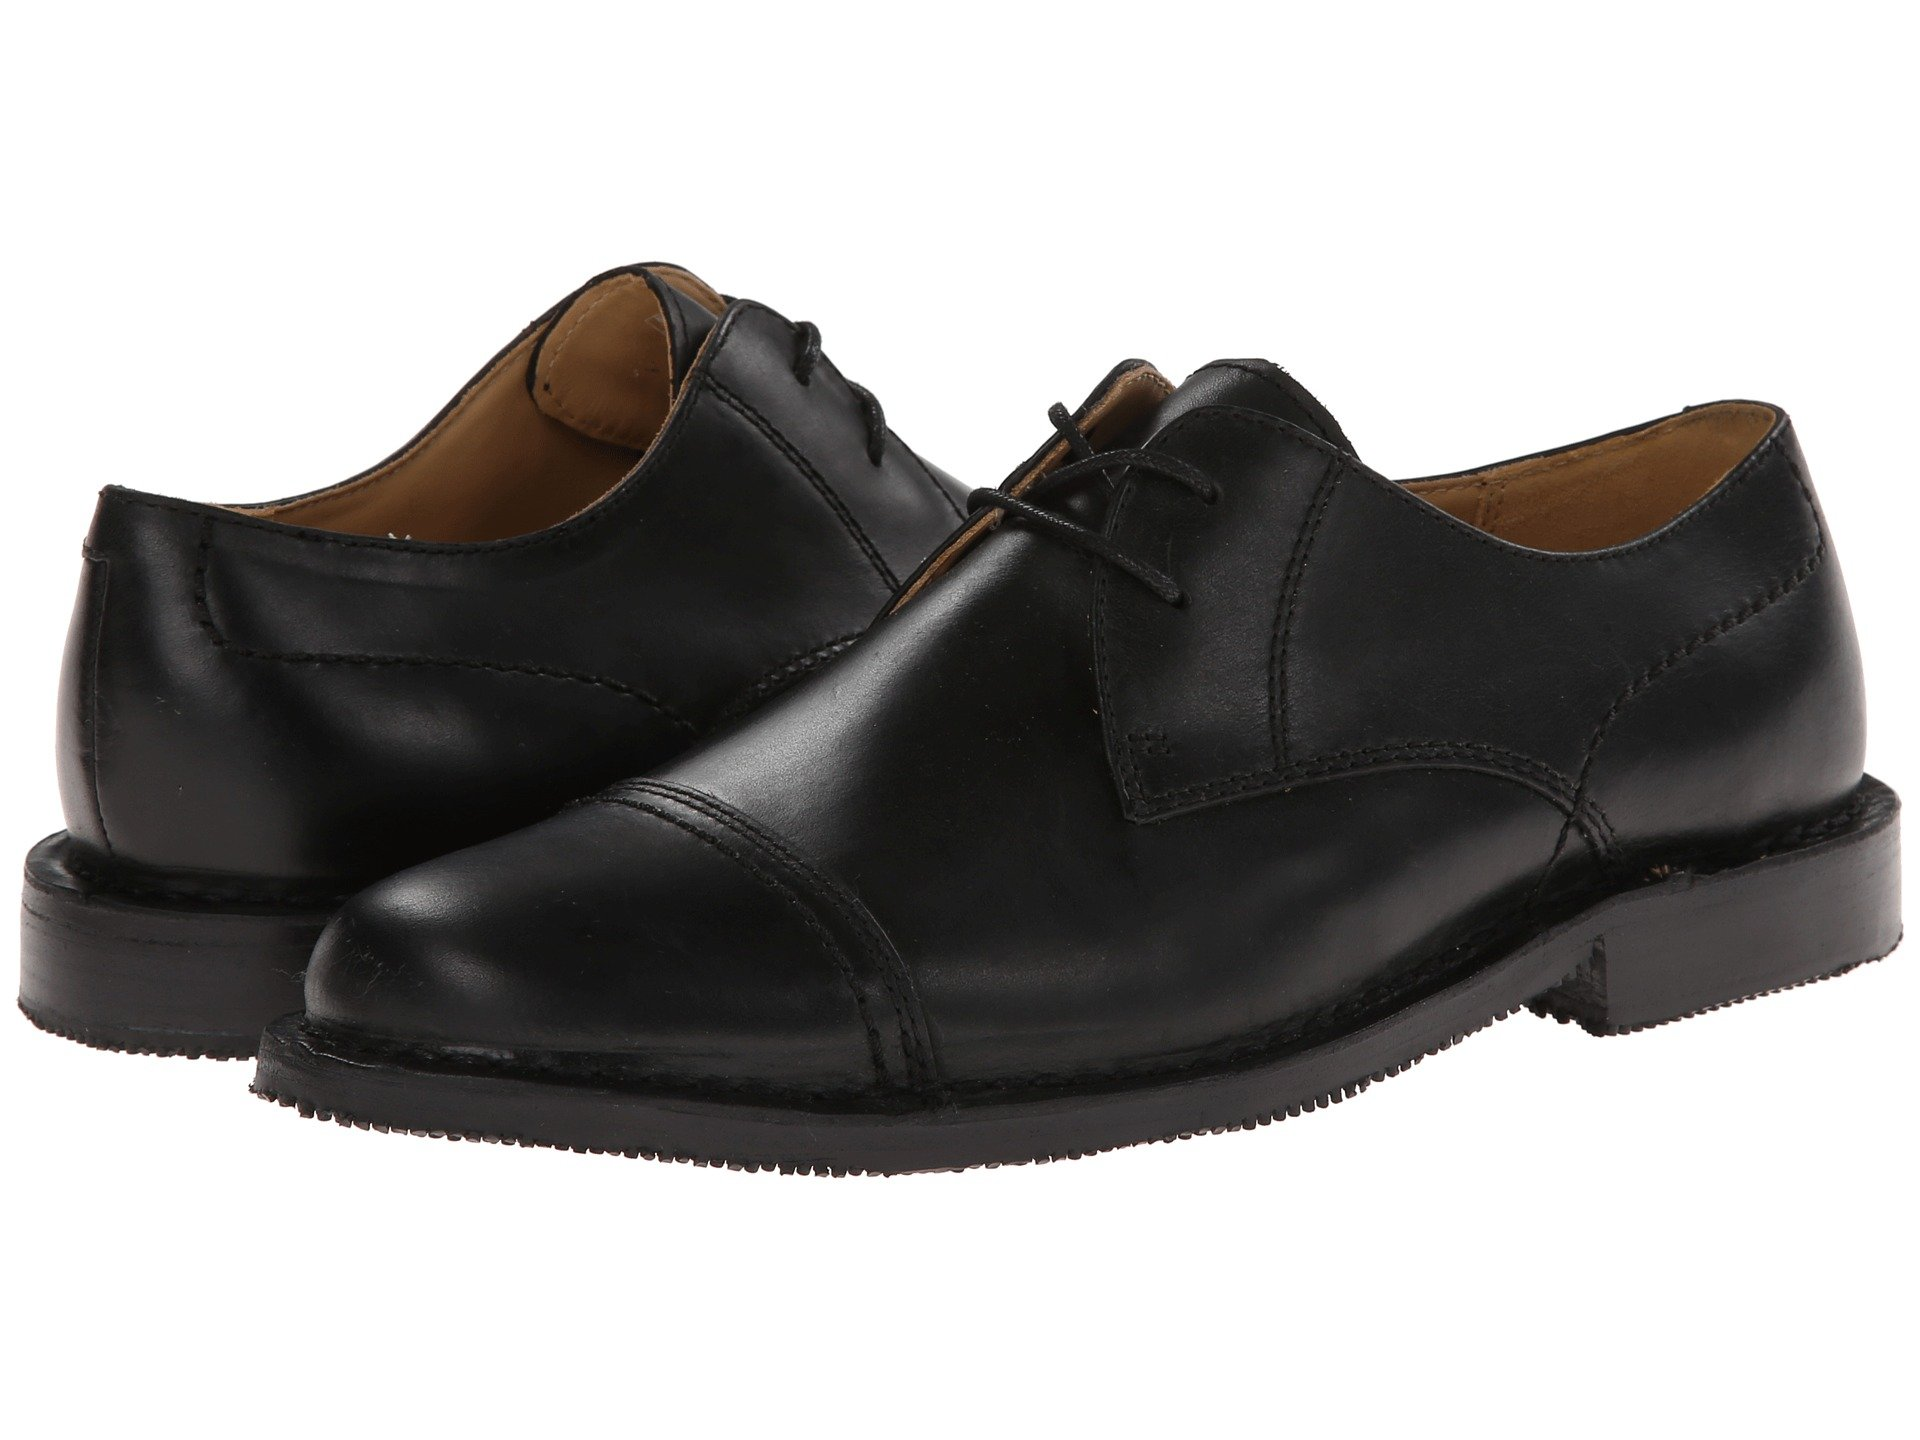 New Sebago Metro Cap Toe Men's Lace Up Cap Toe Shoes, Black Leather